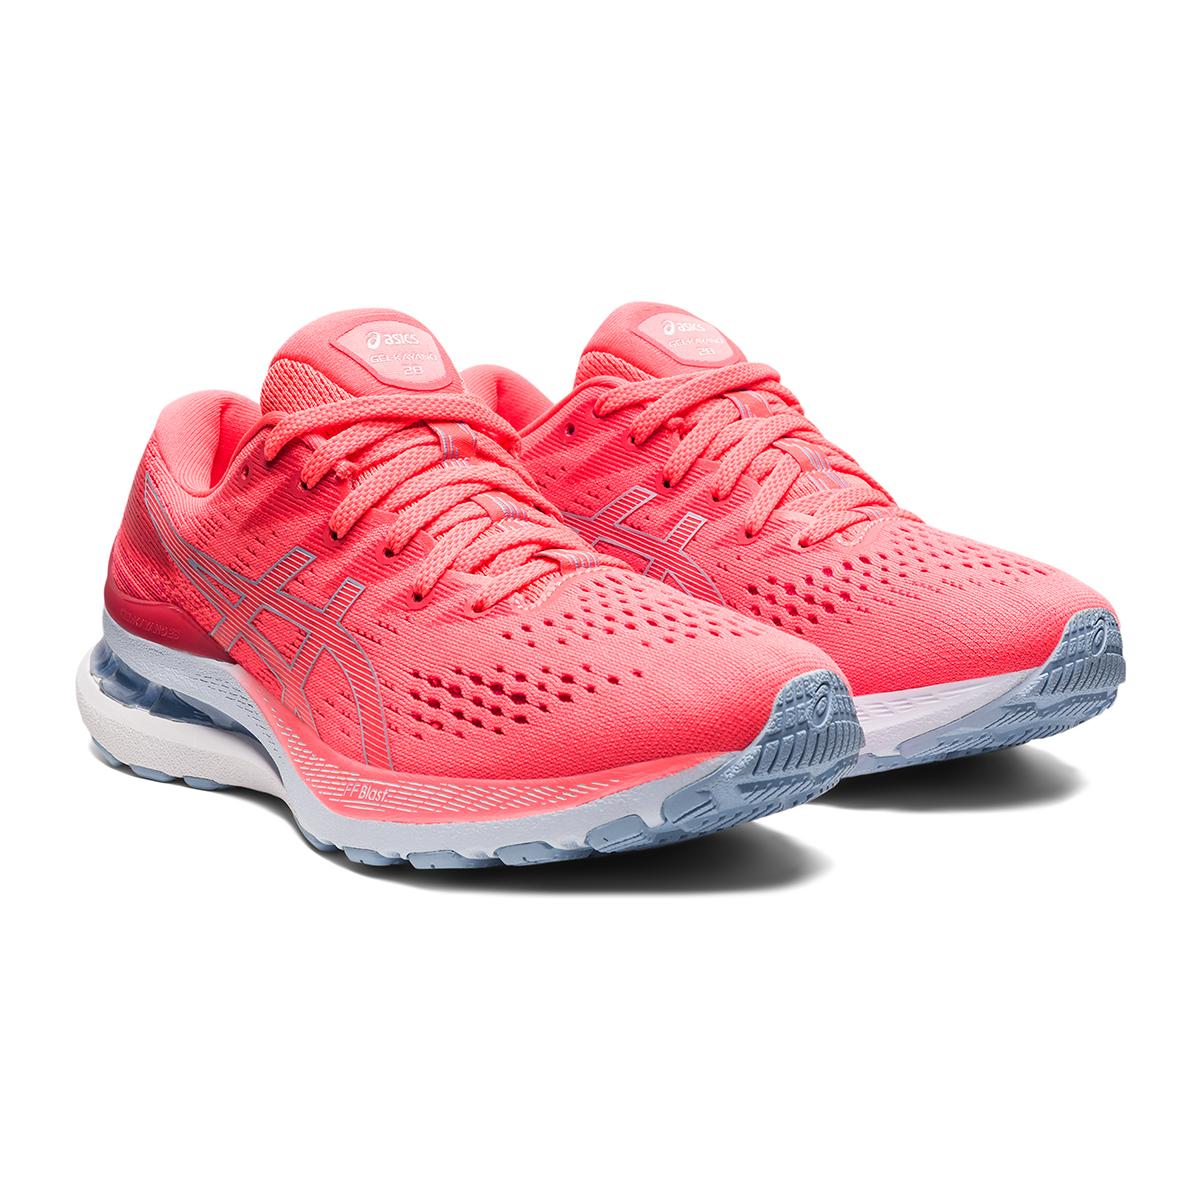 Women's Asics Gel-Kayano 28 Running Shoe - Color: Blazing Coral - Size: 5 - Width: Regular, Blazing Coral, large, image 5